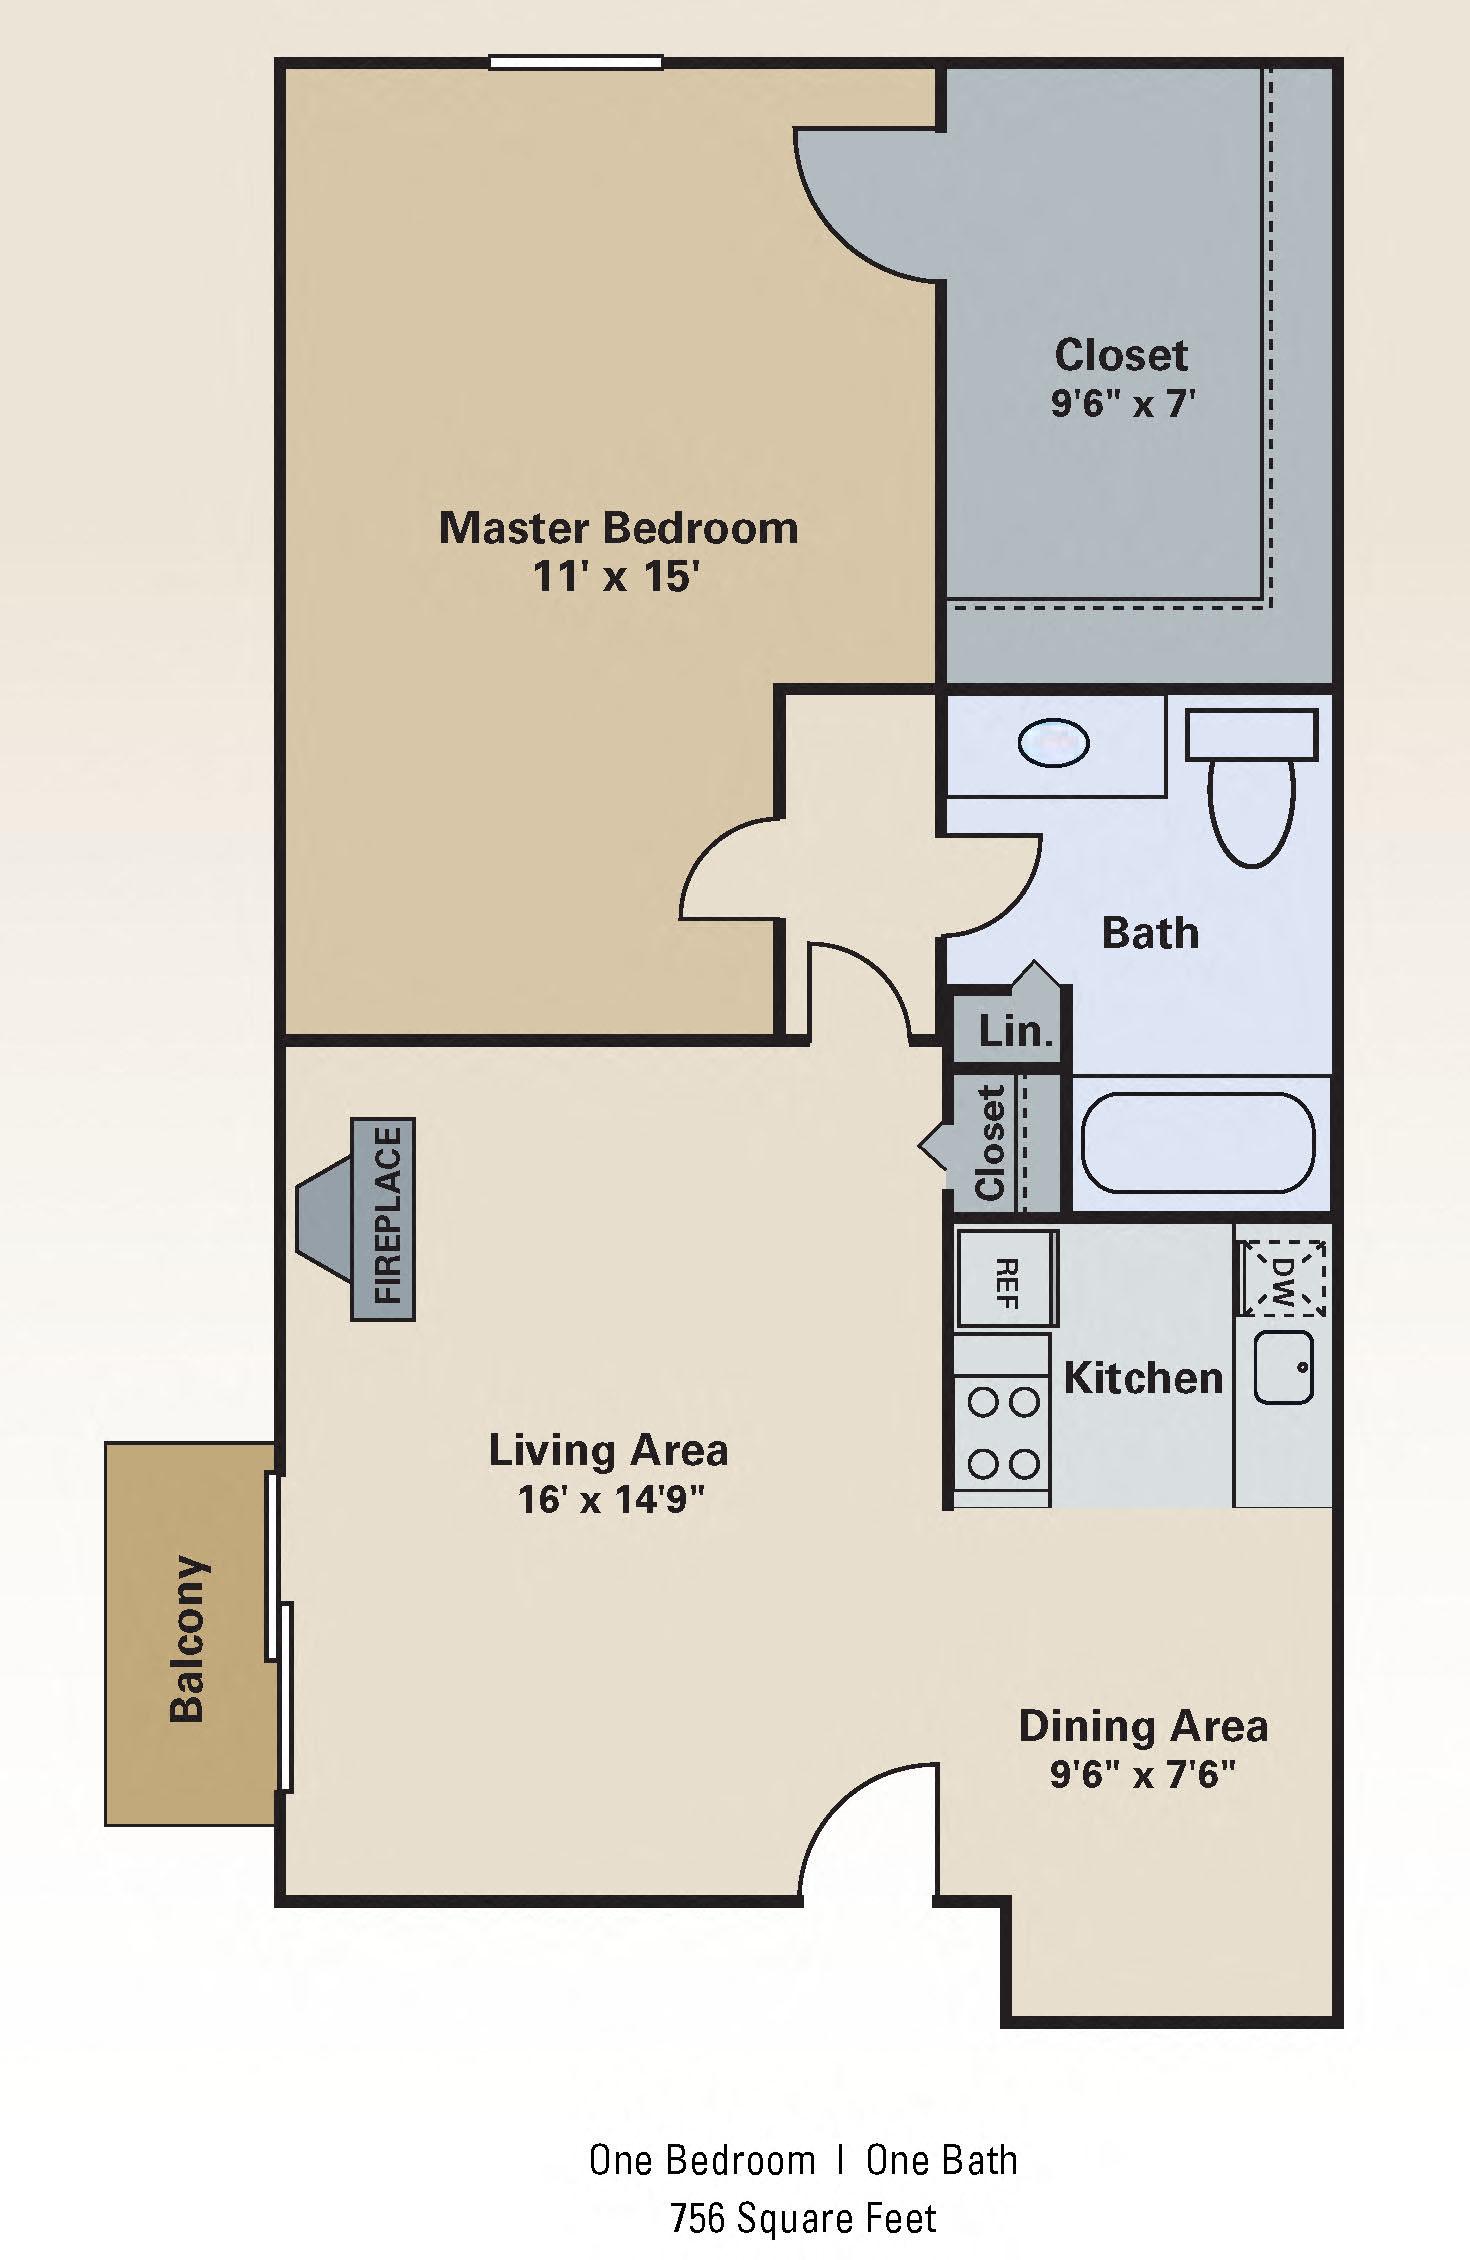 high point east apartments, 9400 e lincoln, wichita, ks - rentcafé